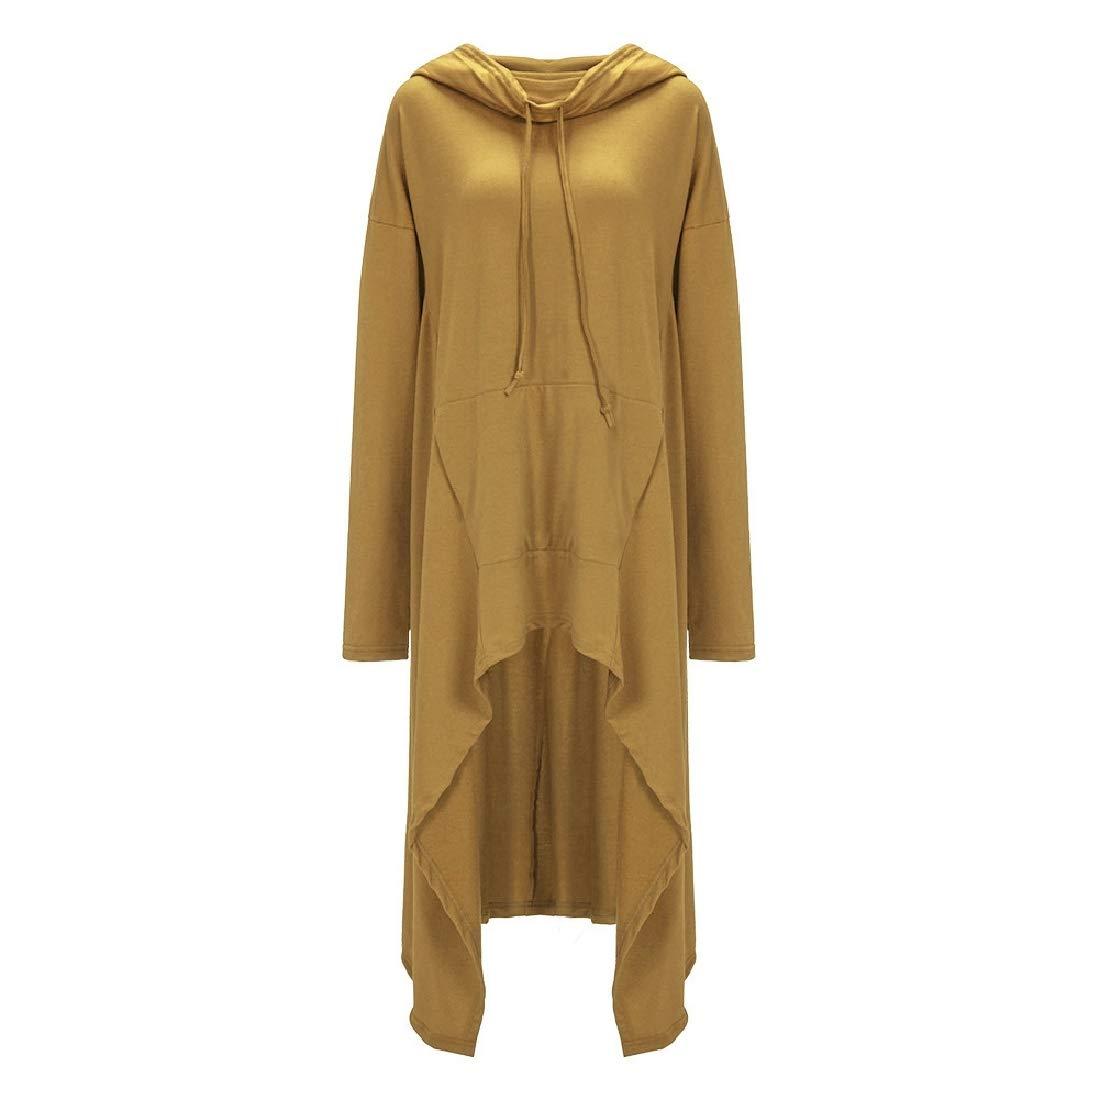 YYG Womens Solid Irregular Hem Casual Plus Size Pullover Hoodies Dress Top